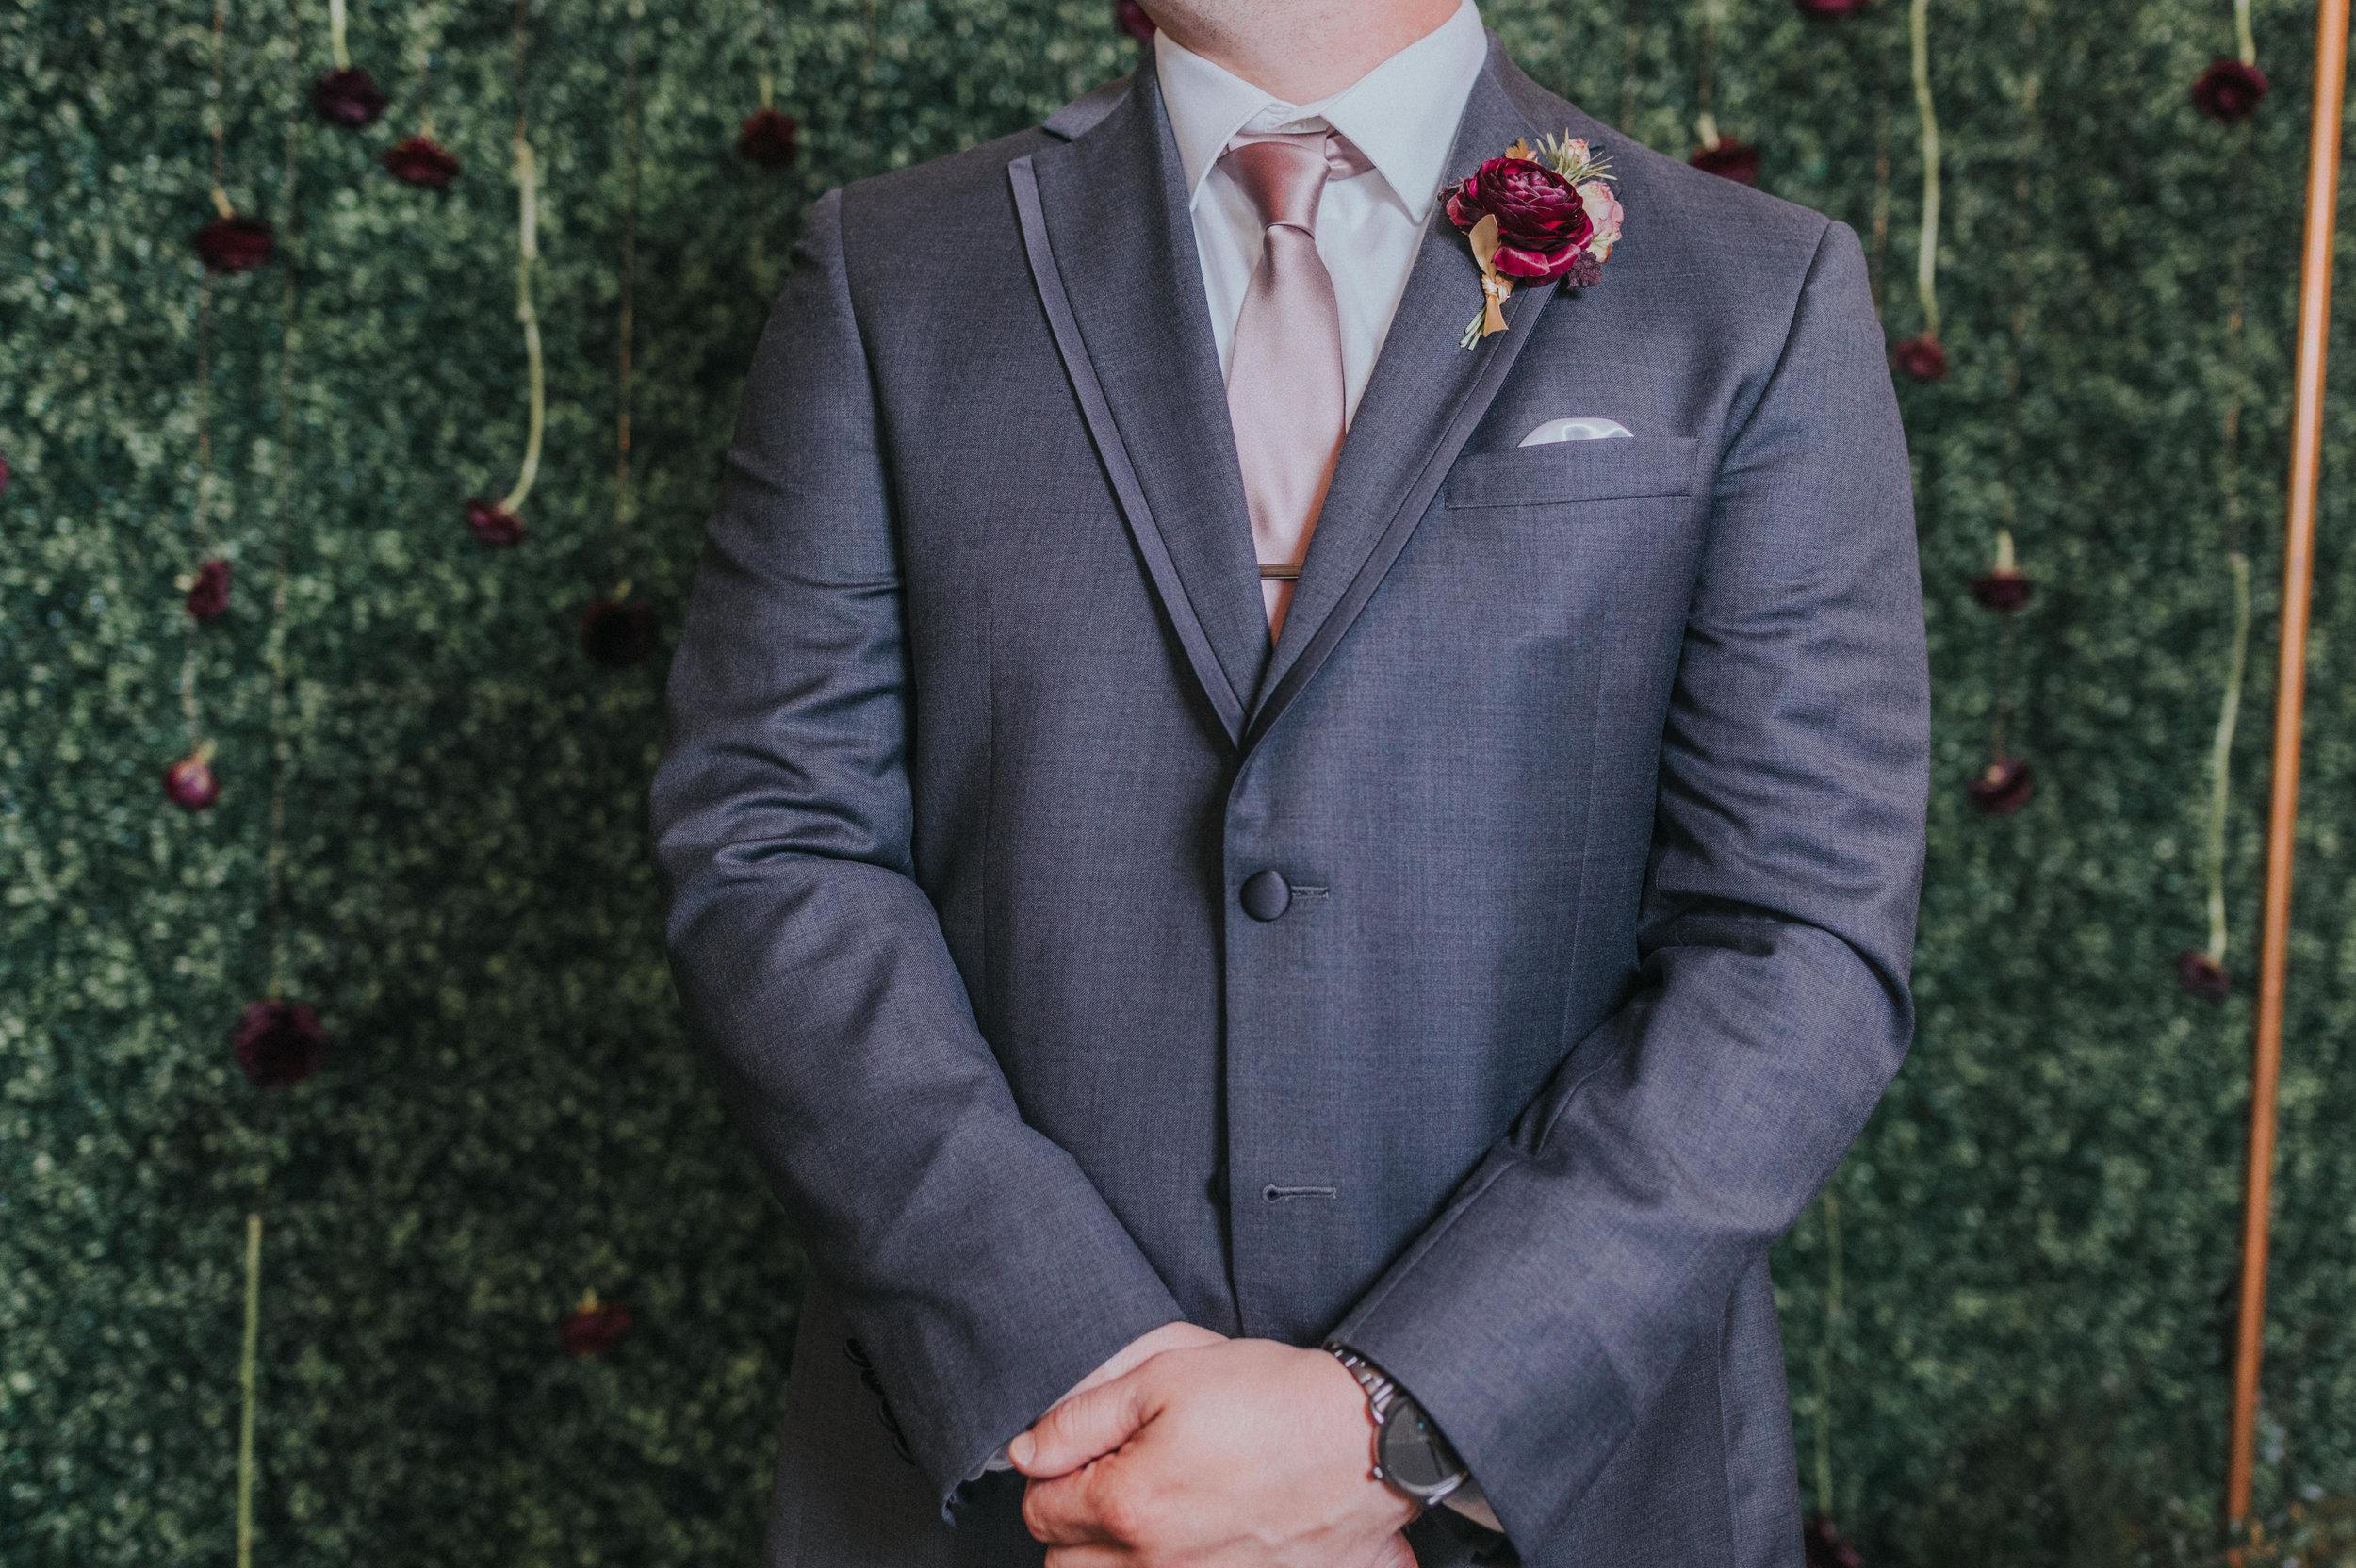 134 tiny-luxe-weddings-omaha-nebraska-midwest-empire-room.jpg